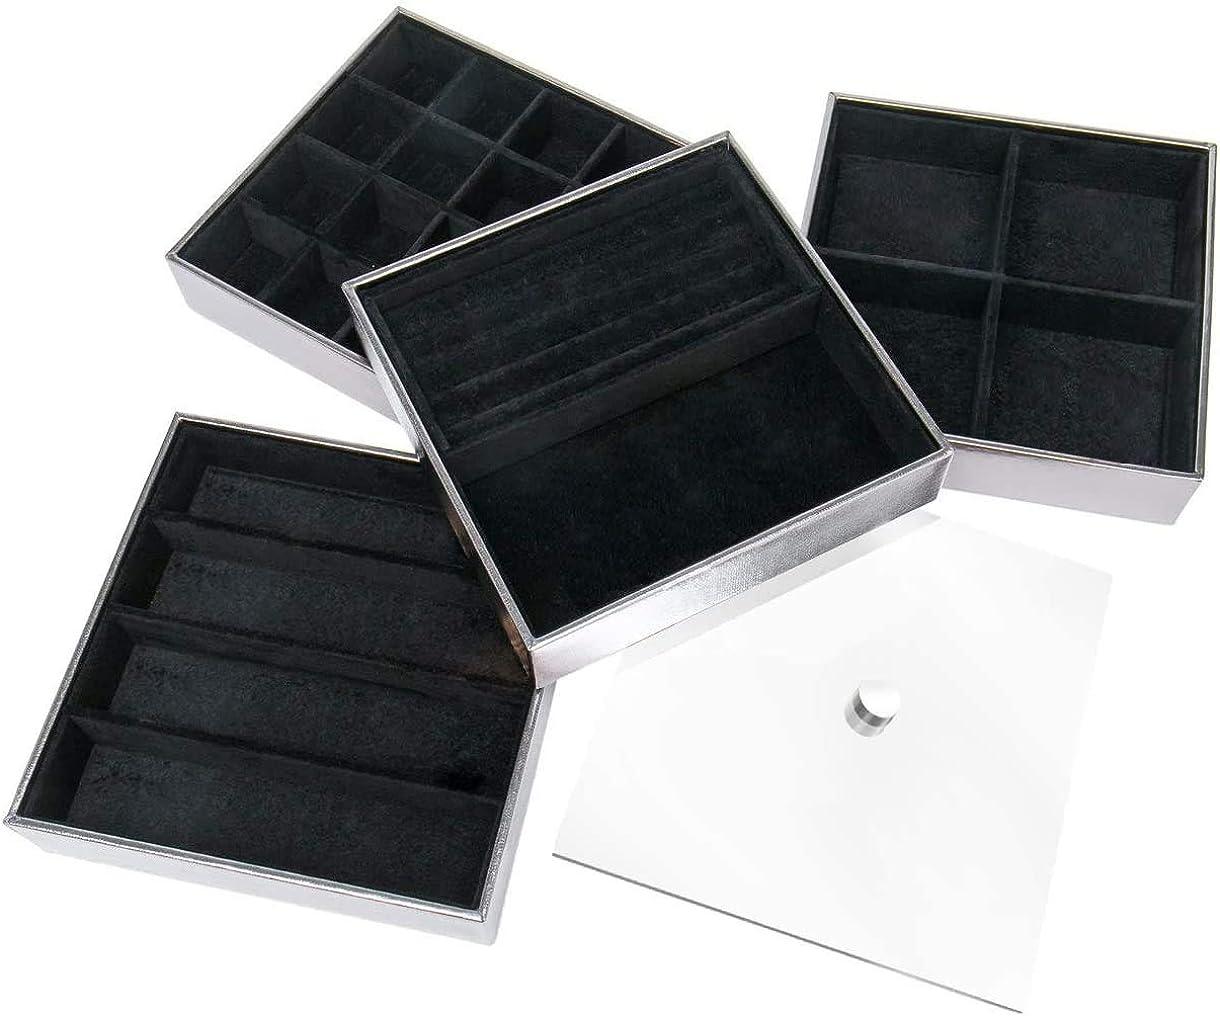 - JackCubeDesign Set mit 4 stapelbaren Lederschmuckschalen mit Acrylbezug Ohrring Halskette Armband Ringbox MK409B Silber